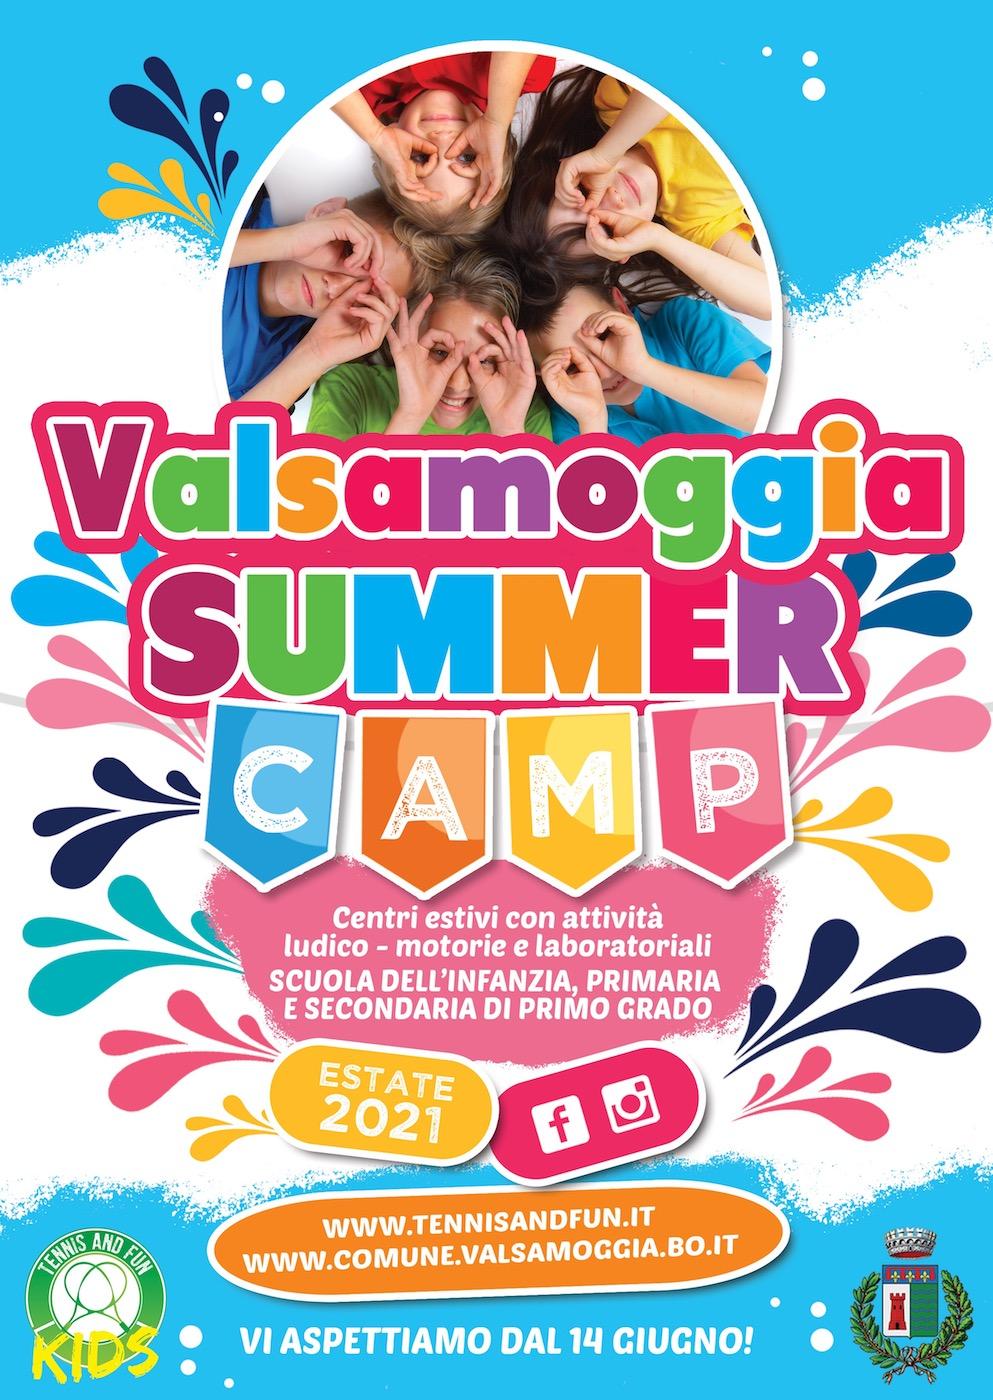 volantino summer camp generico 2021